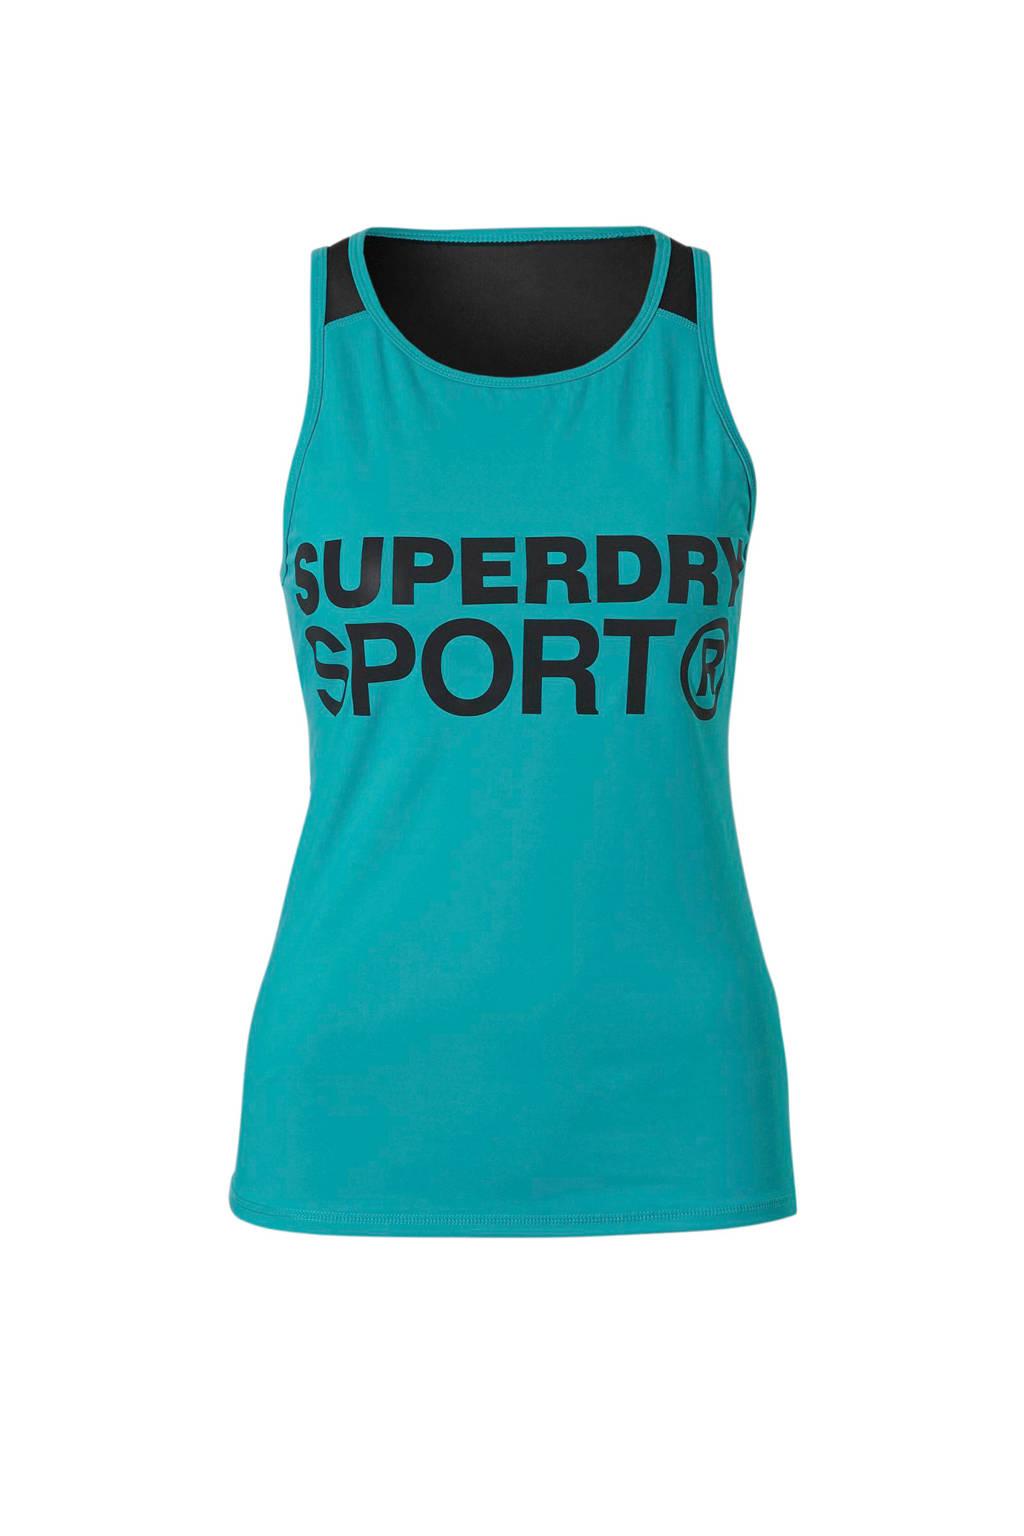 Superdry Sport sport T-shirt met printopdruk turquoise, Turquoise